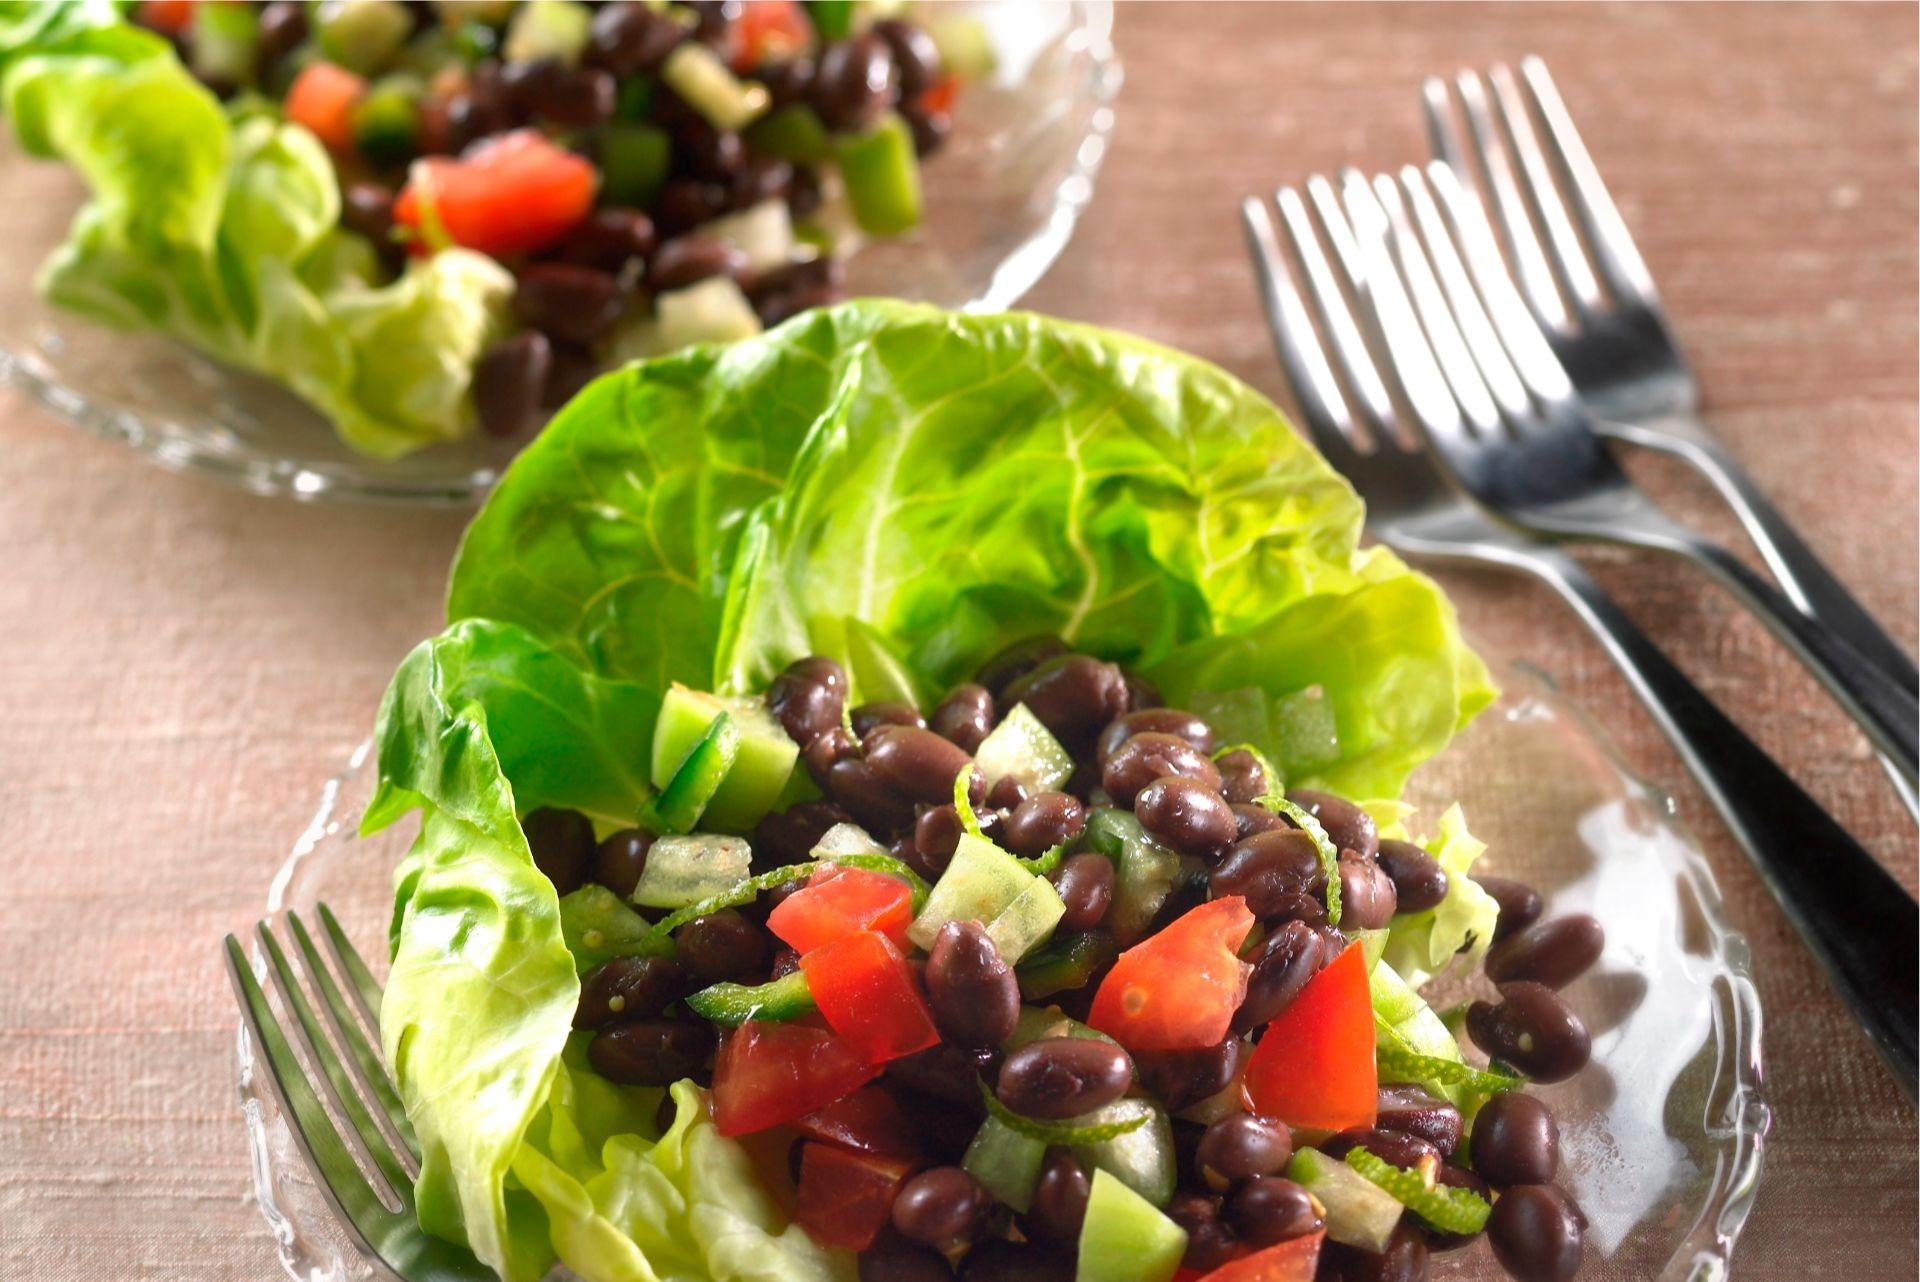 Lime-zested tomatillo-black bean salad on lettuce leaves.